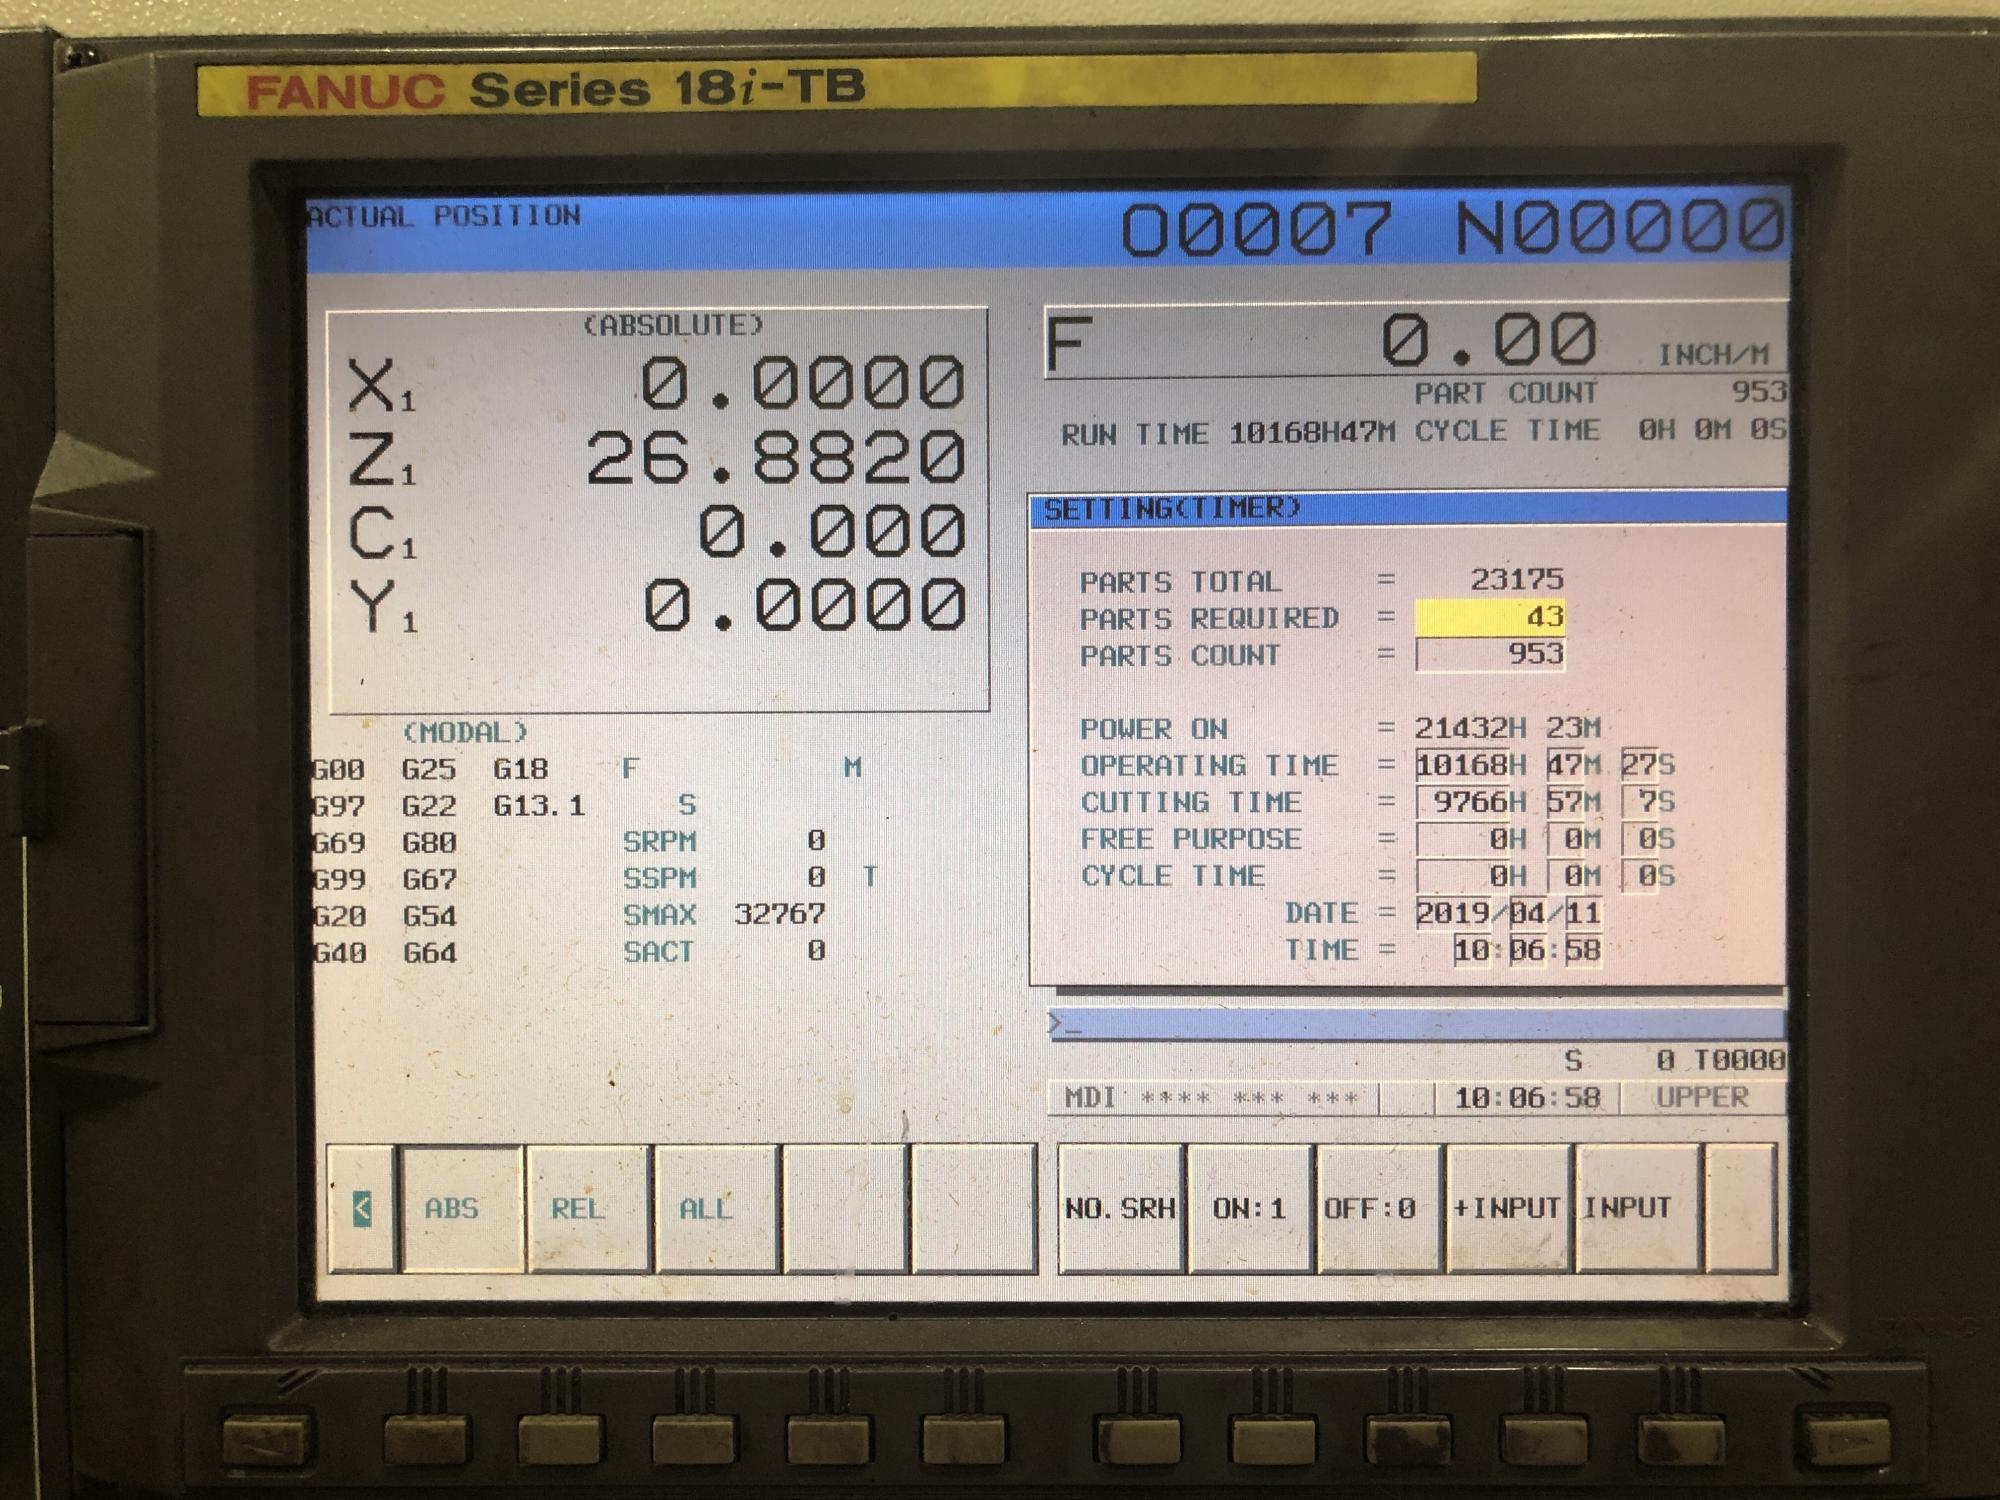 2005 NAKAMURA-TOME WT-300MMYS - CNC Horizontal Lathe